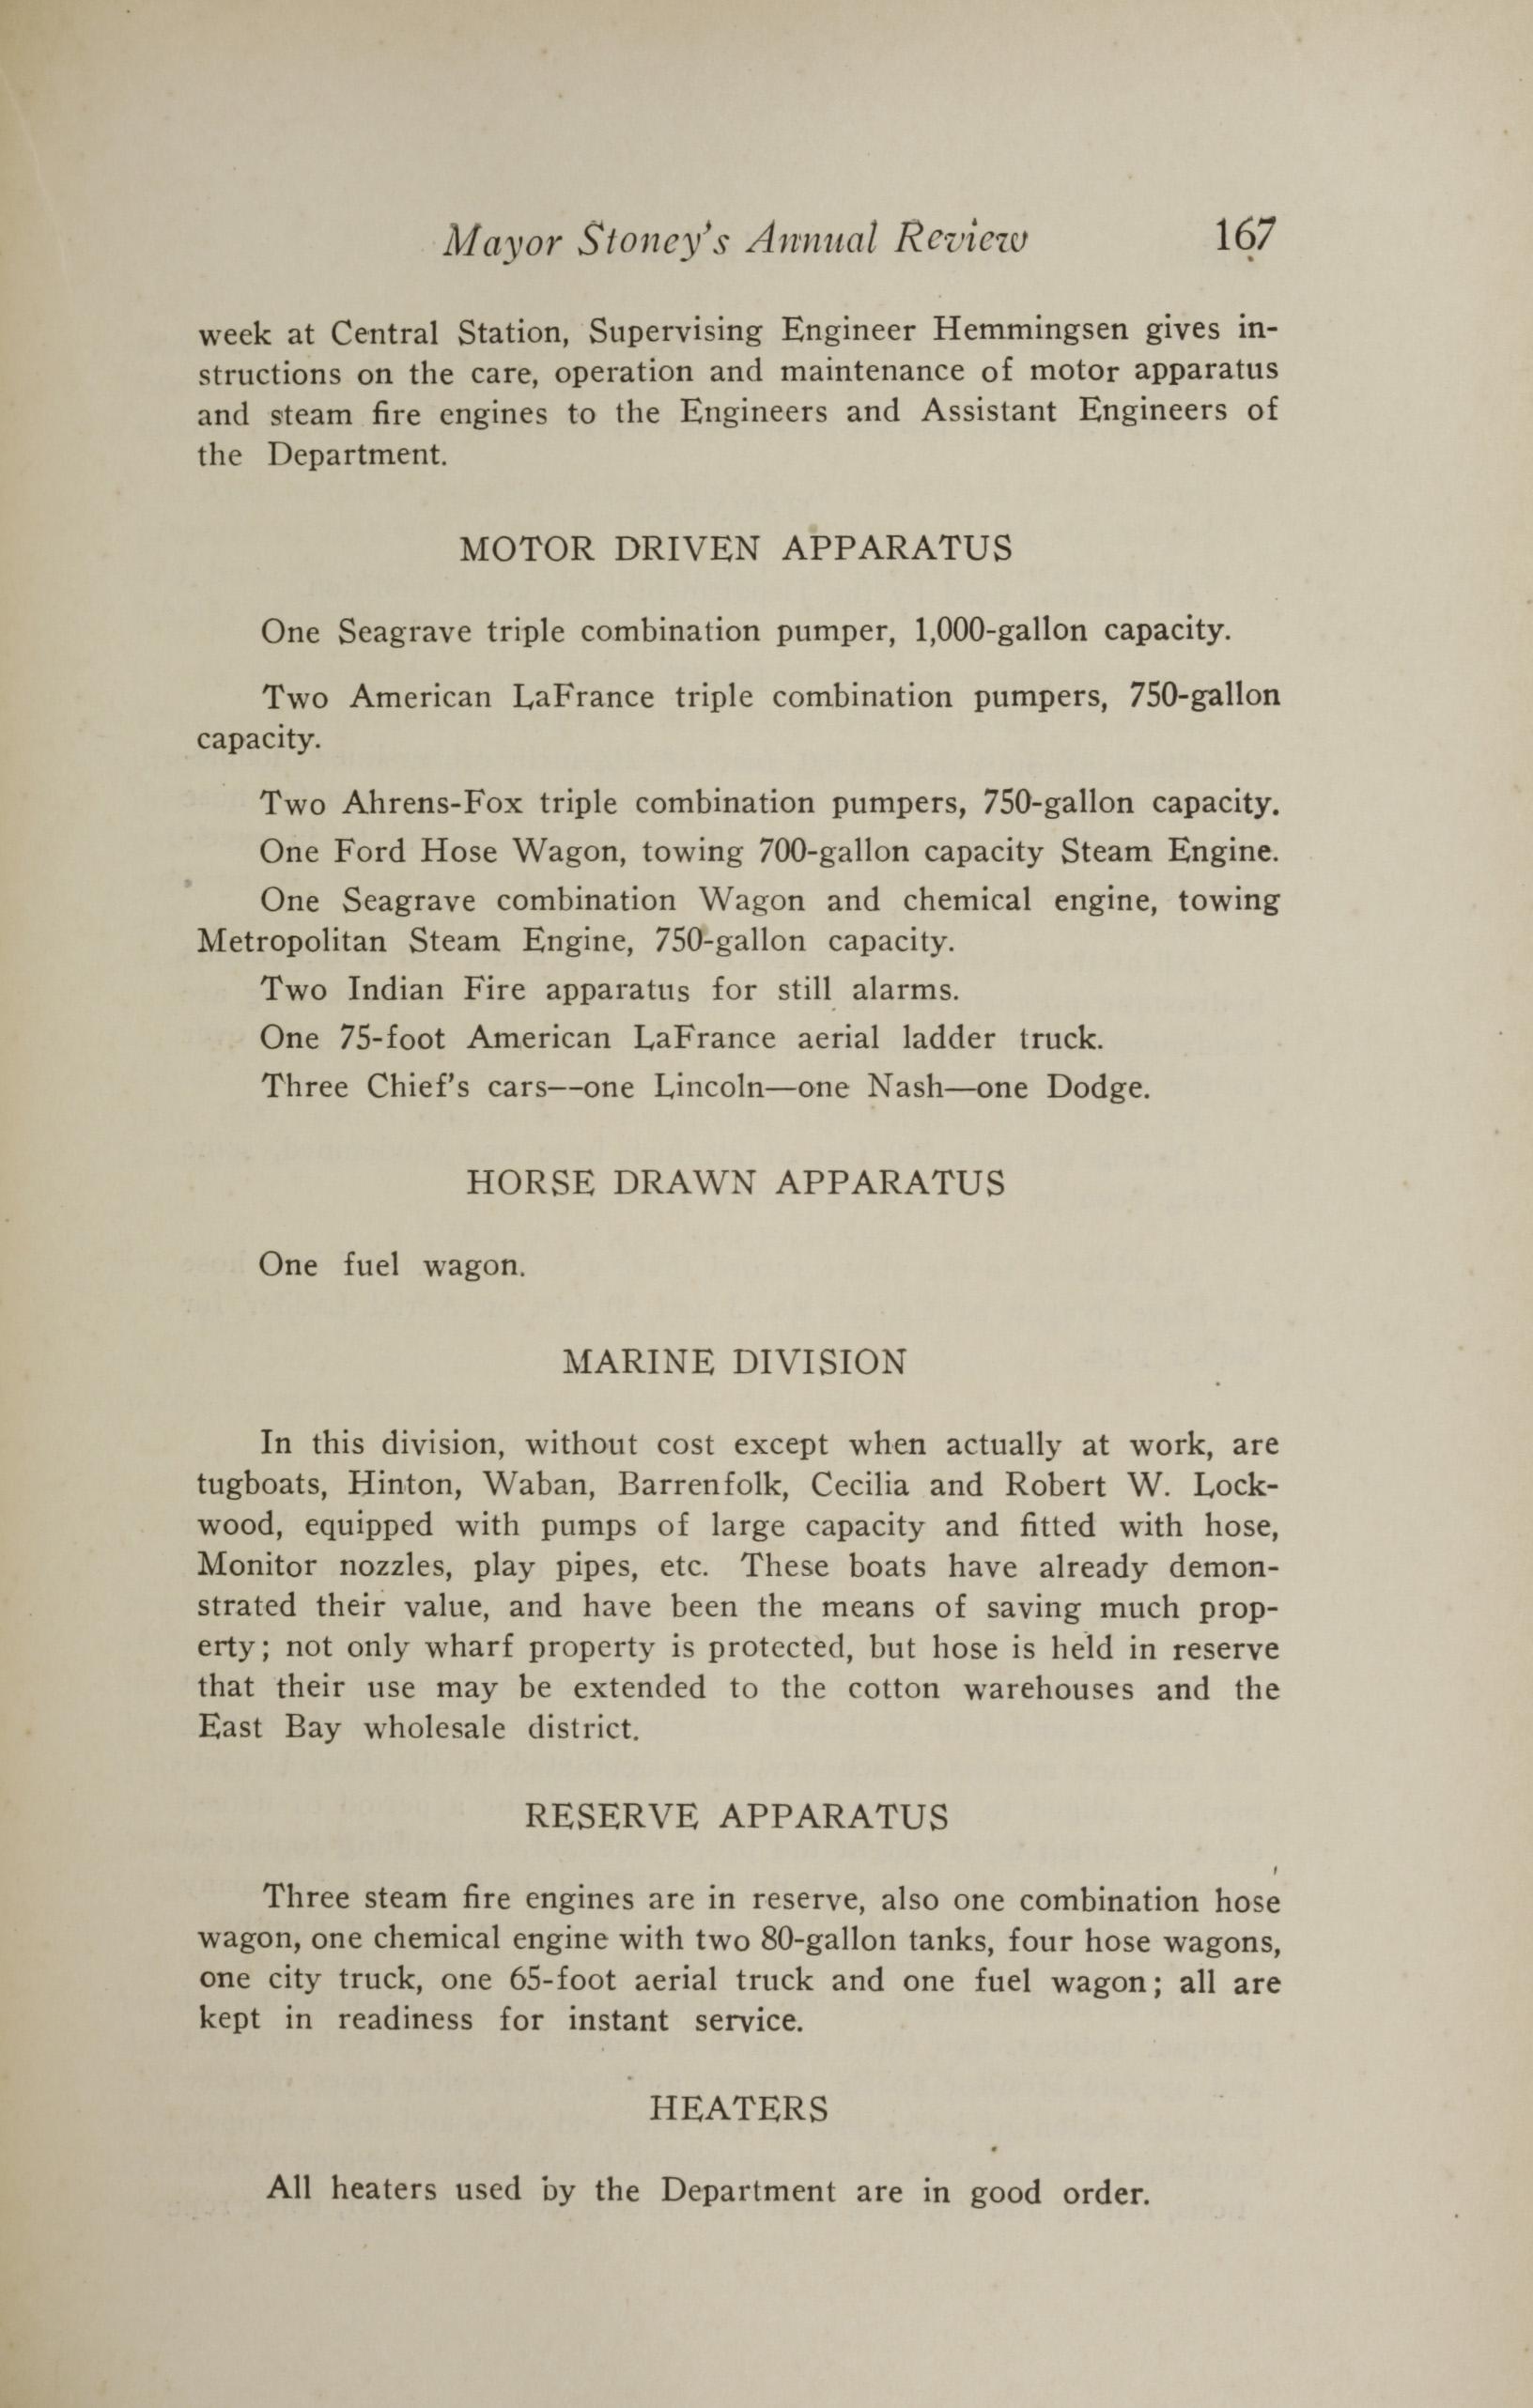 Charleston Yearbook, 1928, page 167